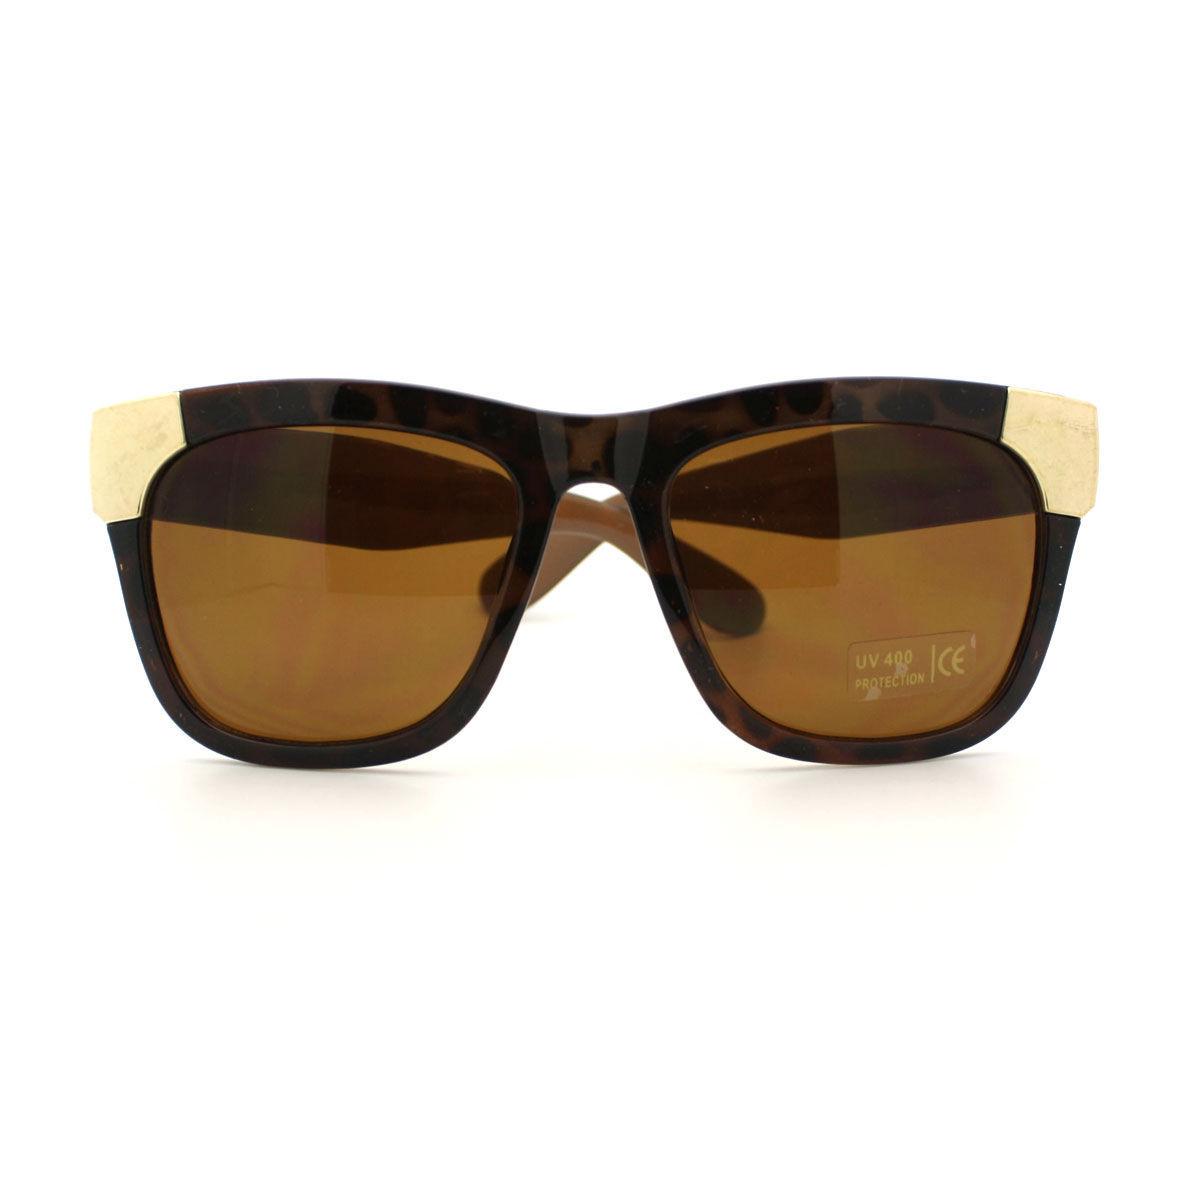 New Womens Sunglasses Retro Modern Runway Fashion Shades